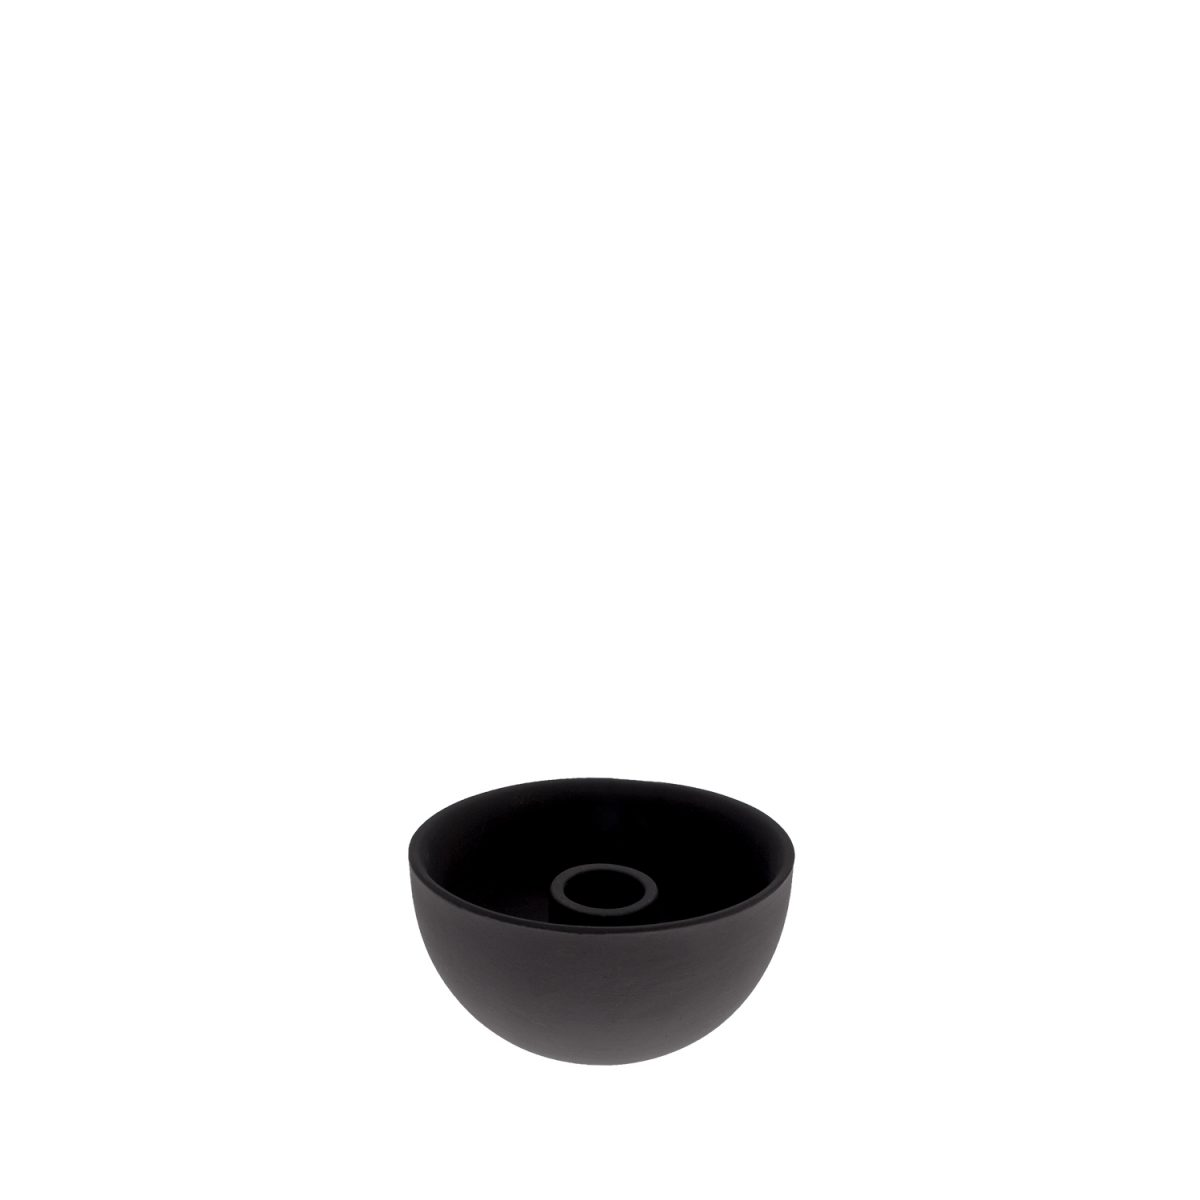 Nützlichdekoration - Storefactory LIDATORP Kerzenhalter grau S 10 cm - Onlineshop Tante Emmer